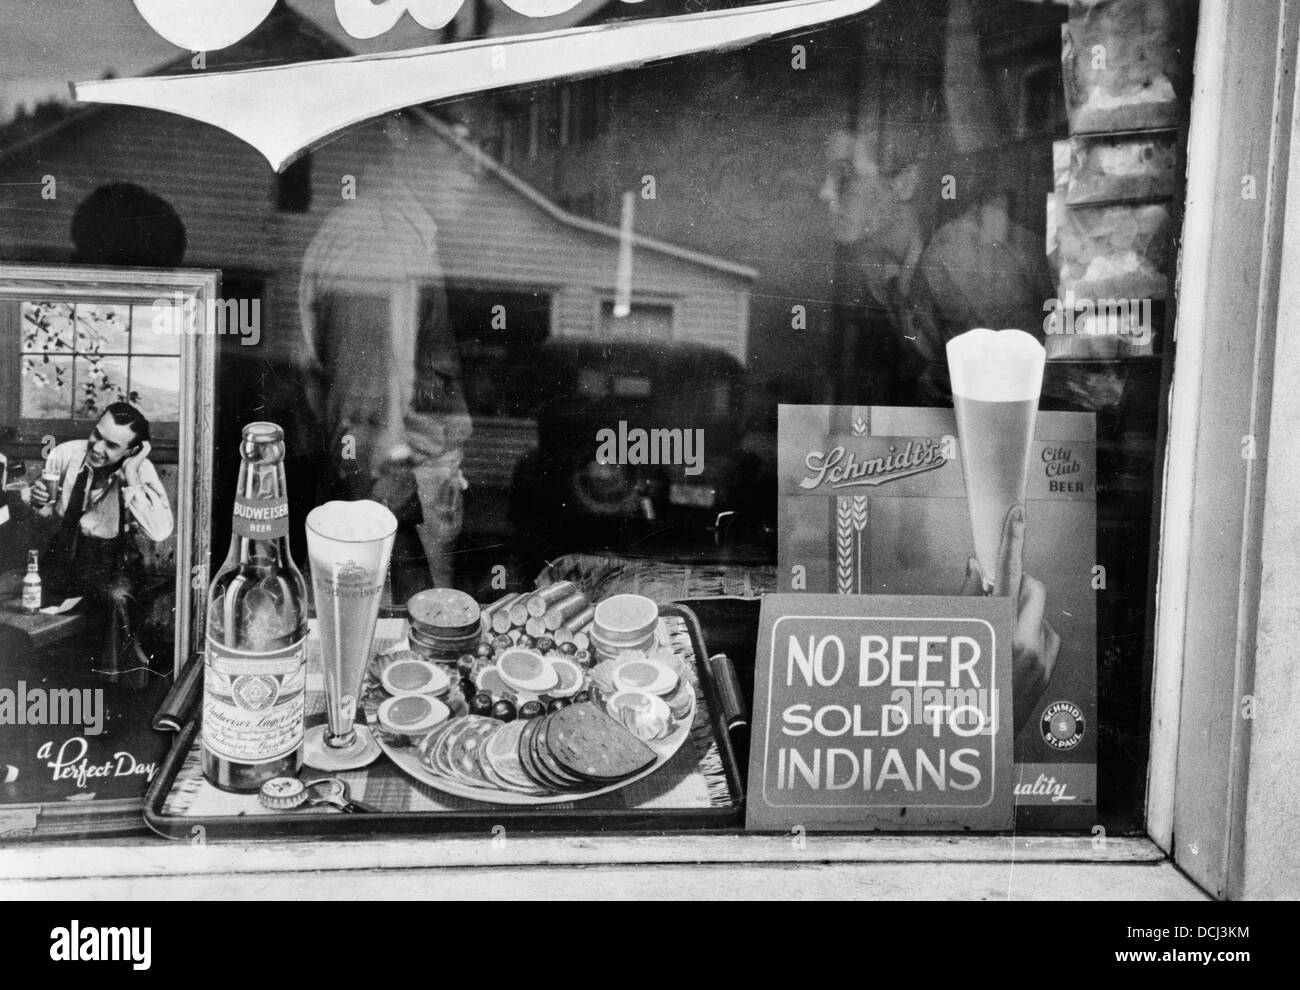 No se vende cerveza a los indios signo - cervecería ventana, Sisseton, South Dakota, circa 1939 Imagen De Stock